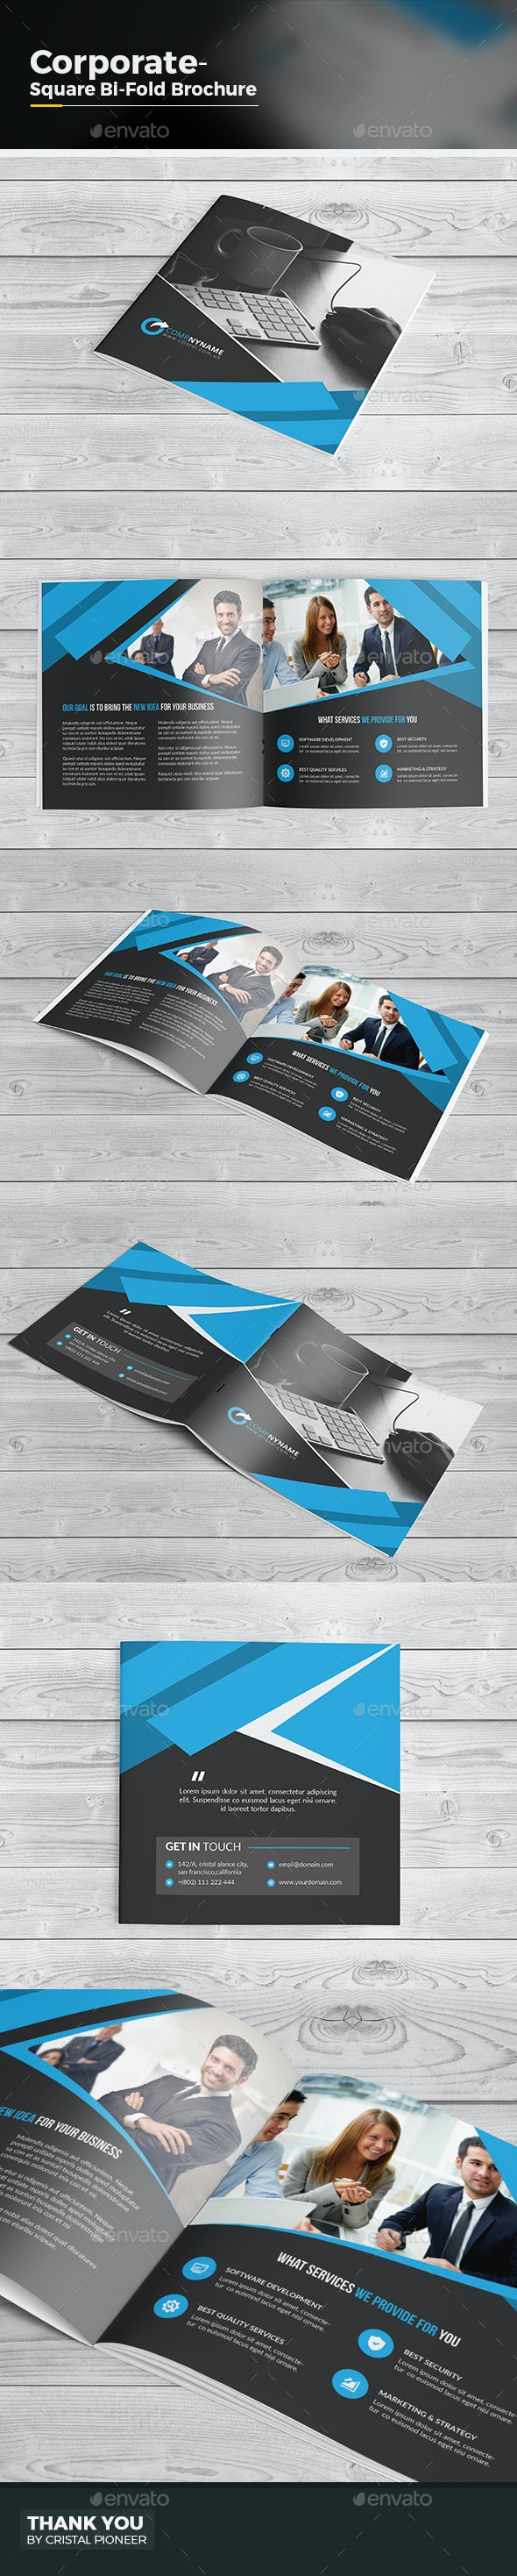 Square Bi Fold Business Brochure - Corporate Brochures